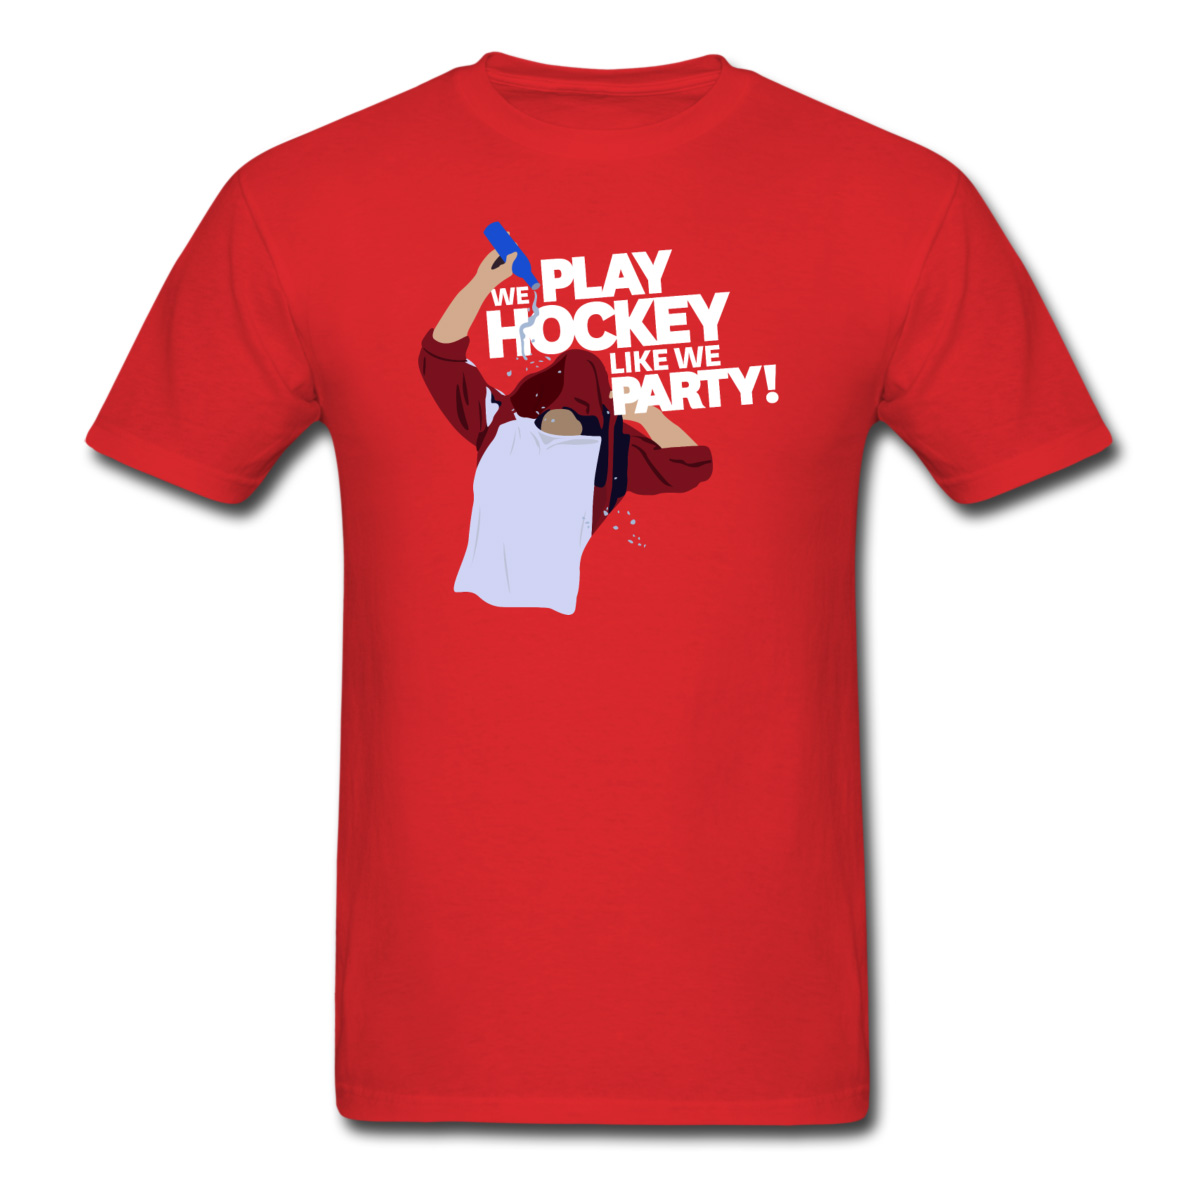 info for b7b93 8e0c2 New RMNB shirt: We play hockey like we party